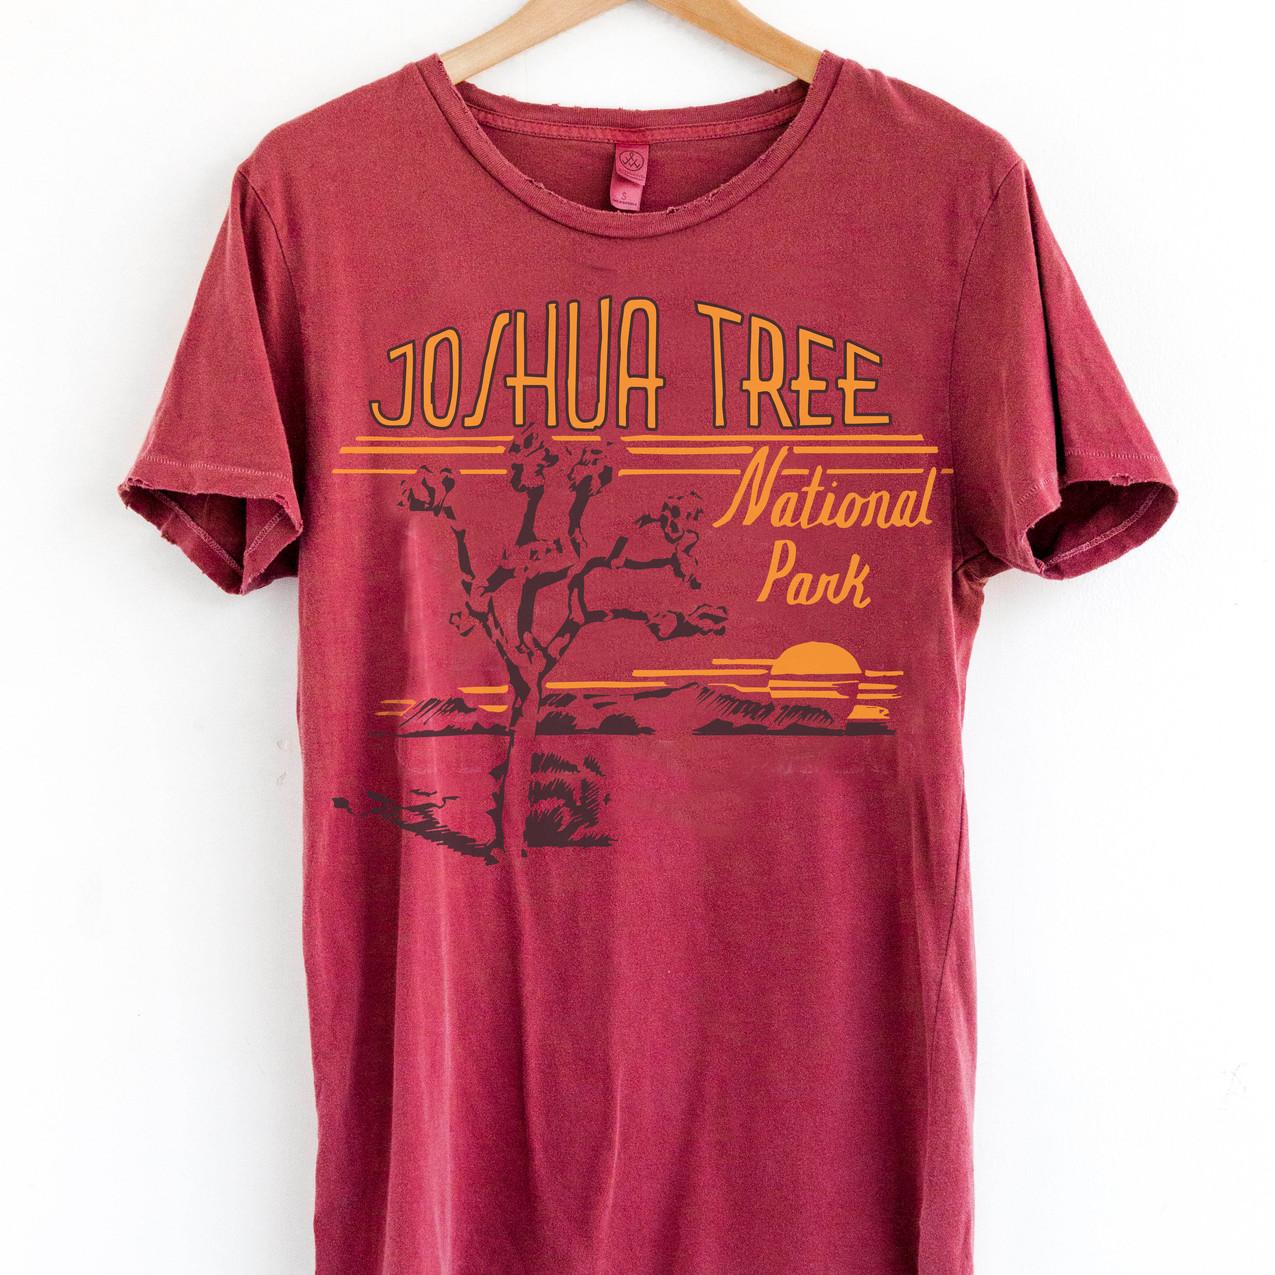 NP Joshua Tree Red Heritage Tee